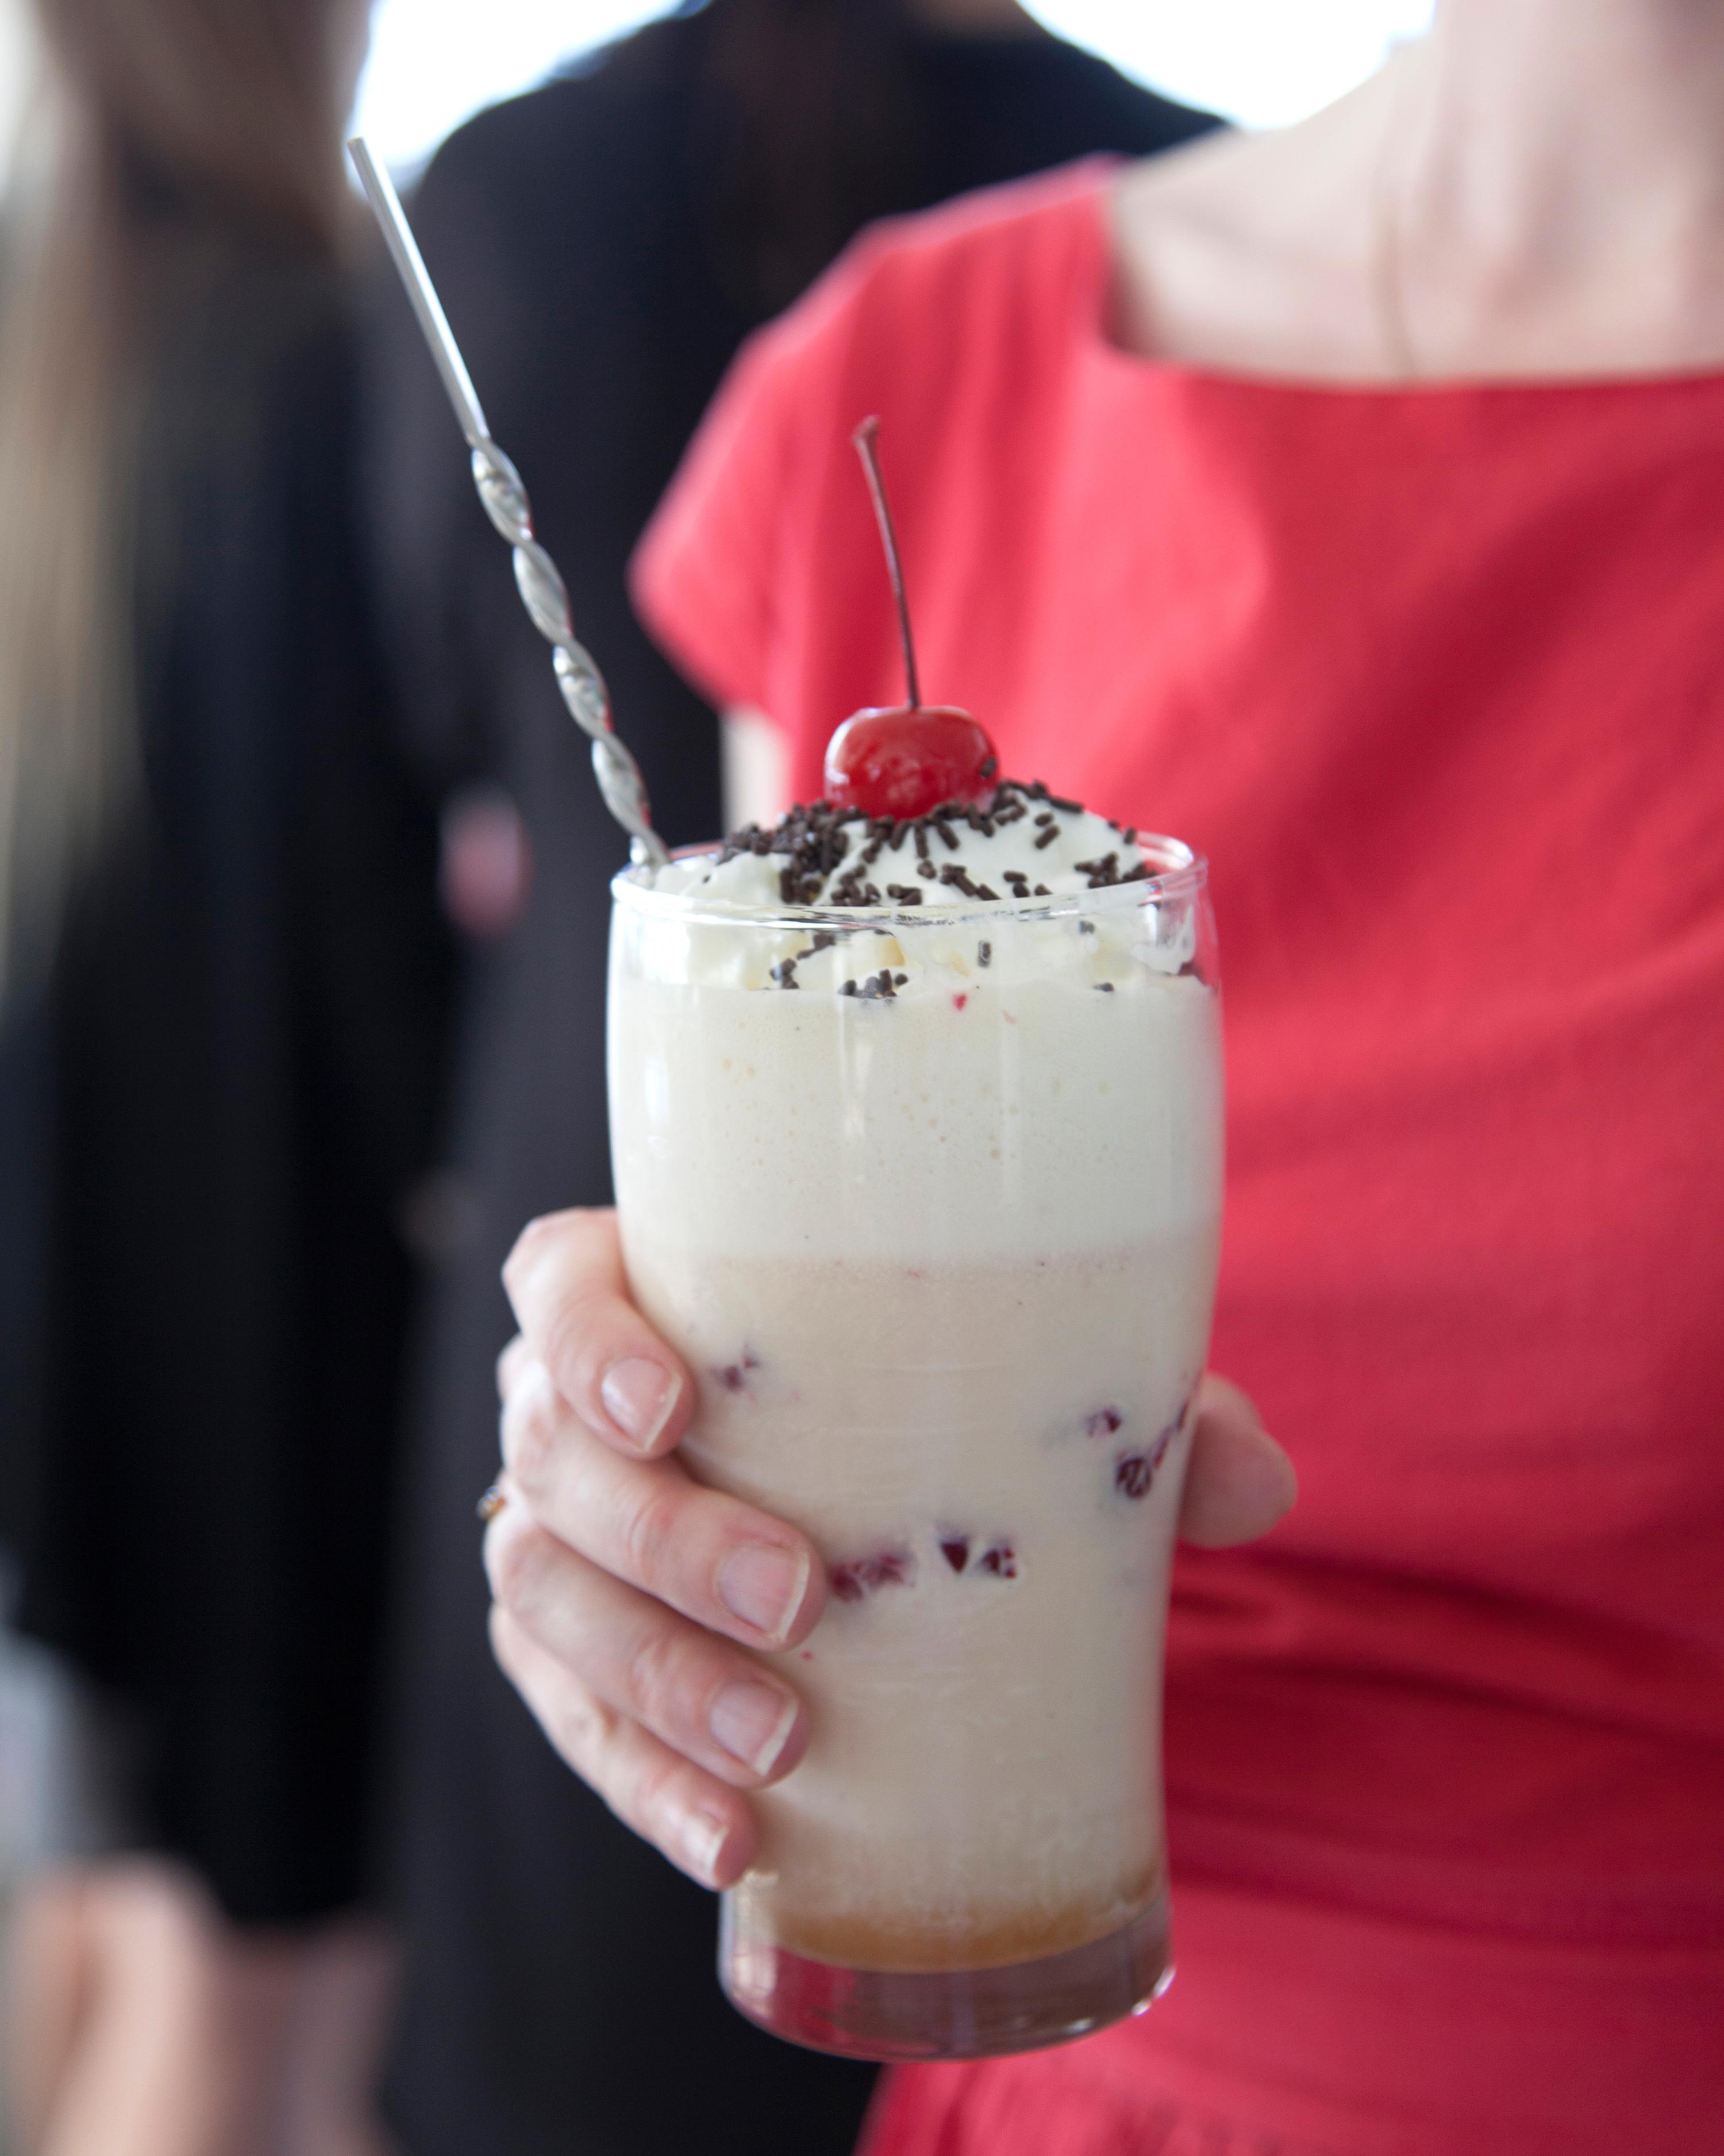 retro-ice-cream-parlor-bridal-shower-milkshake-sources-0815.jpg